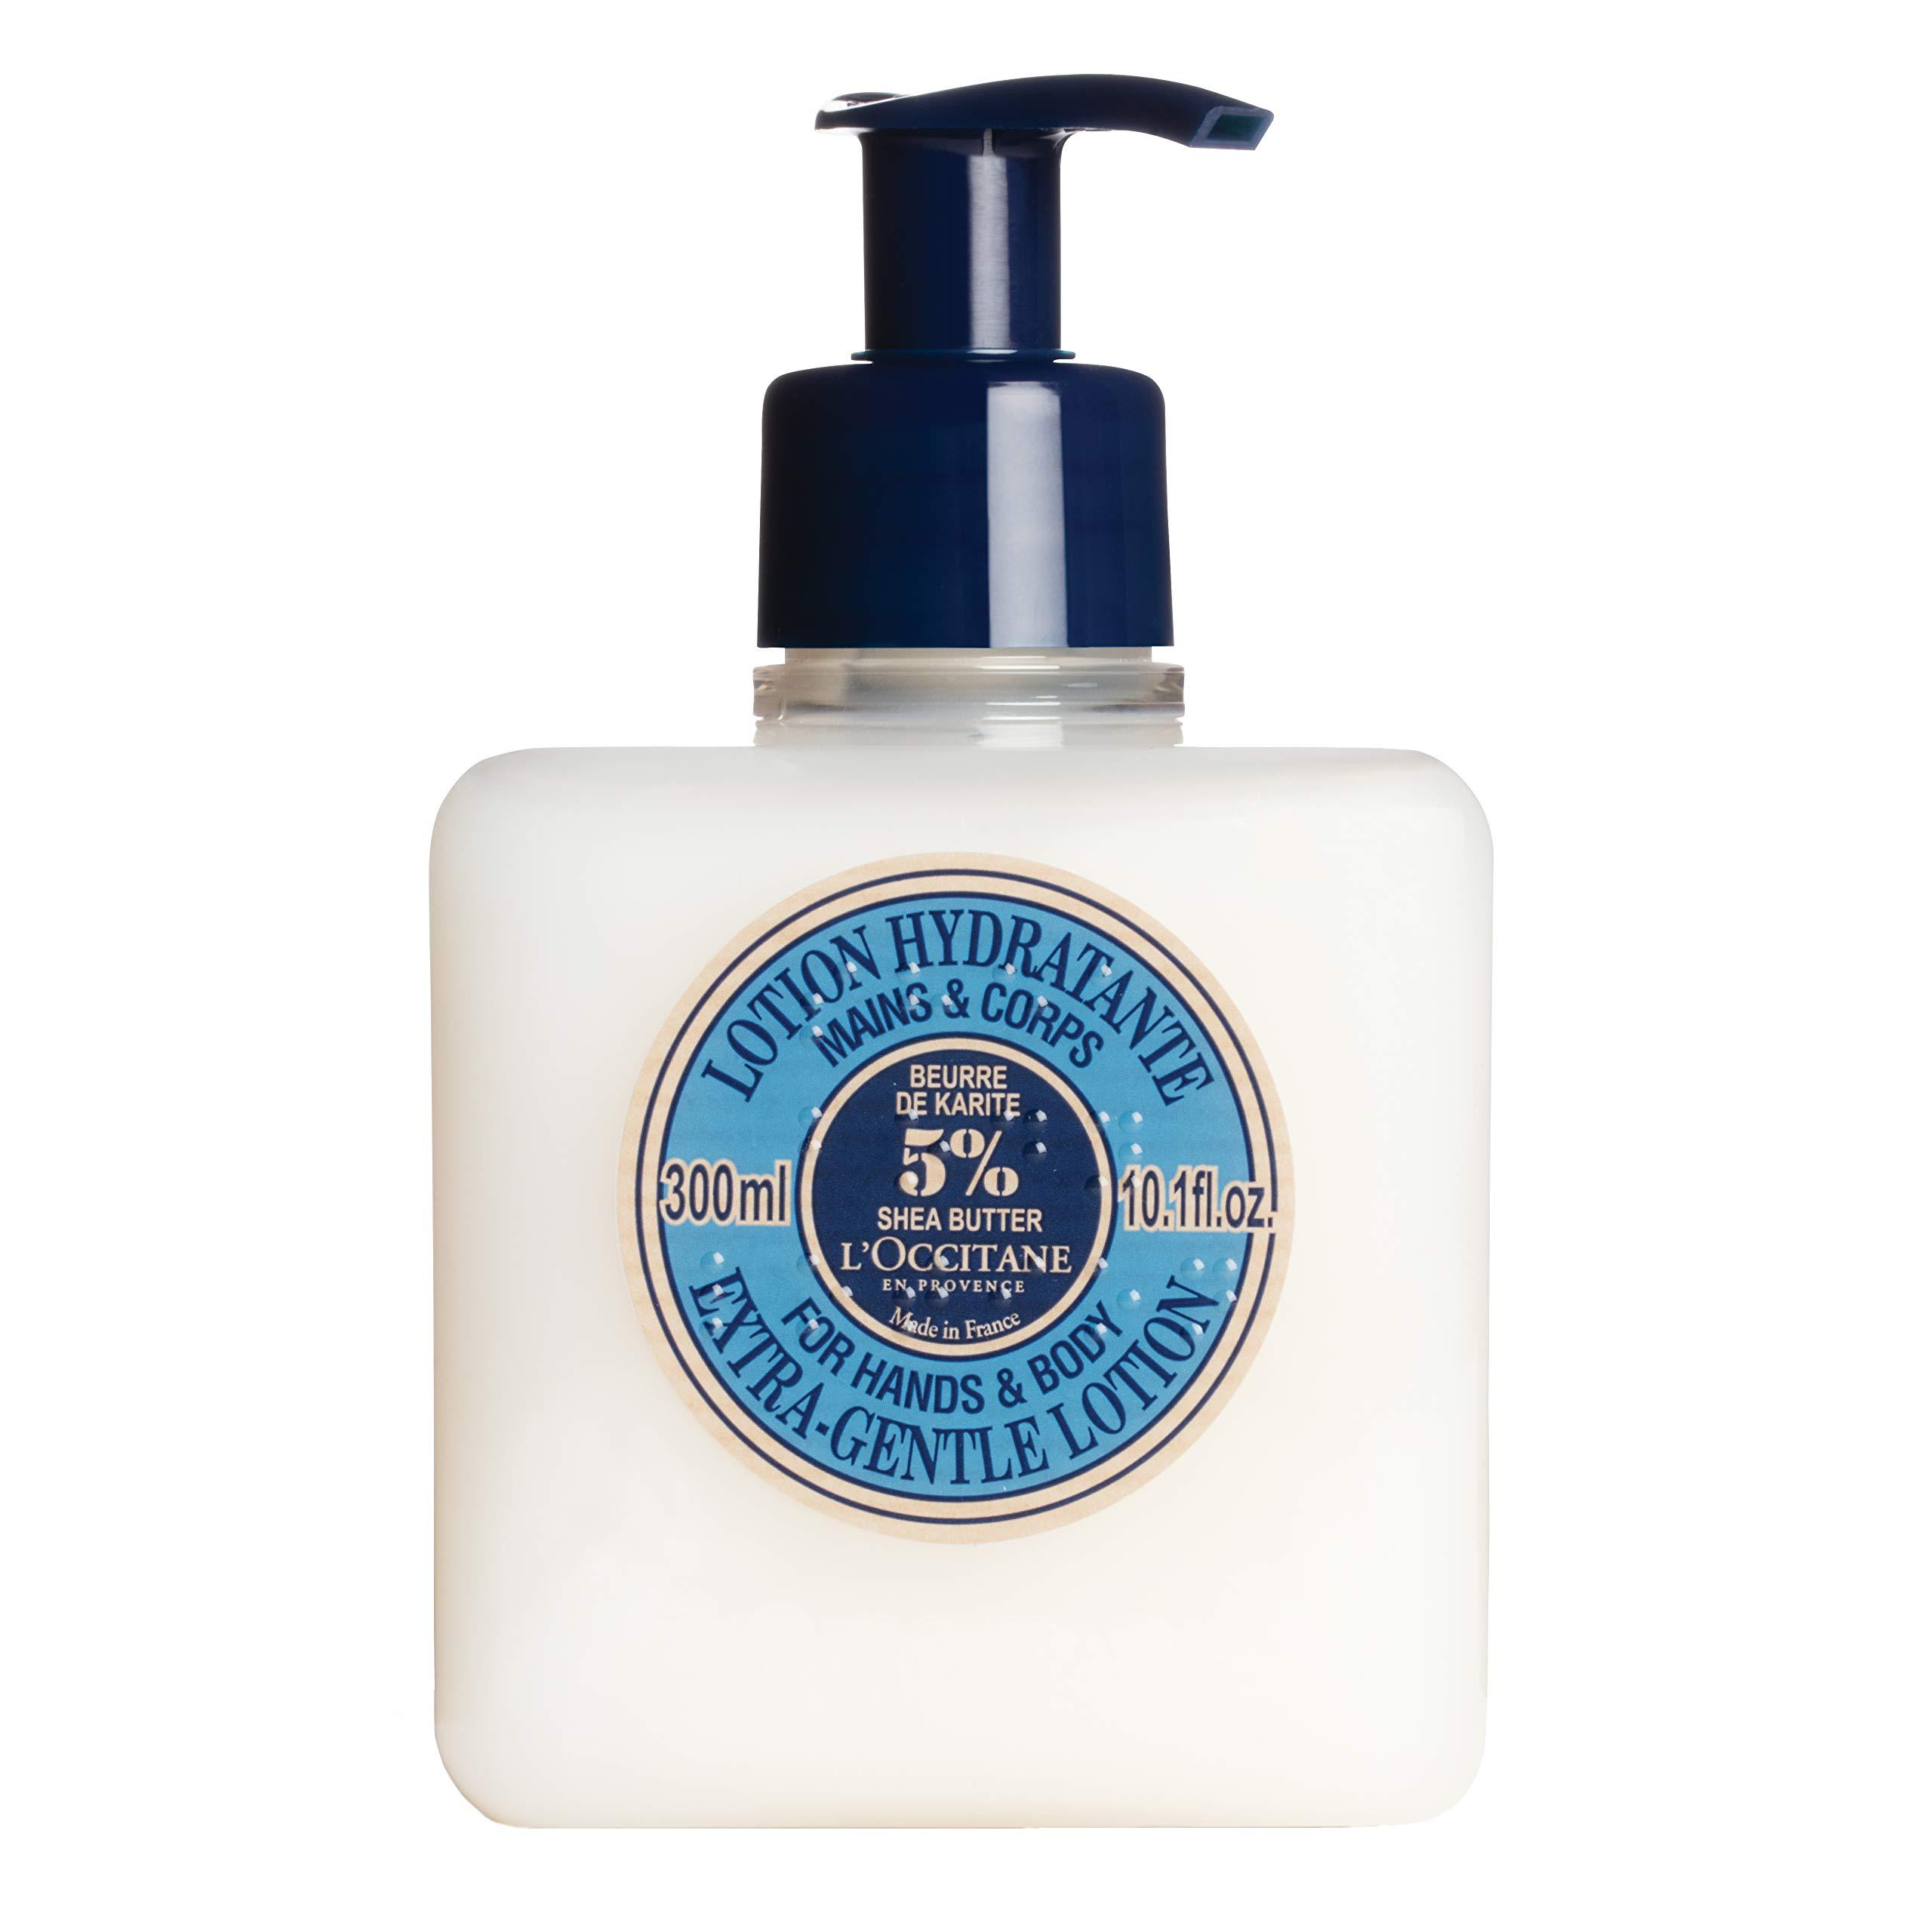 L'Occitane Extra-Gentle 5% Shea Butter Hand & Body Lotion, 10.1 fl. oz.